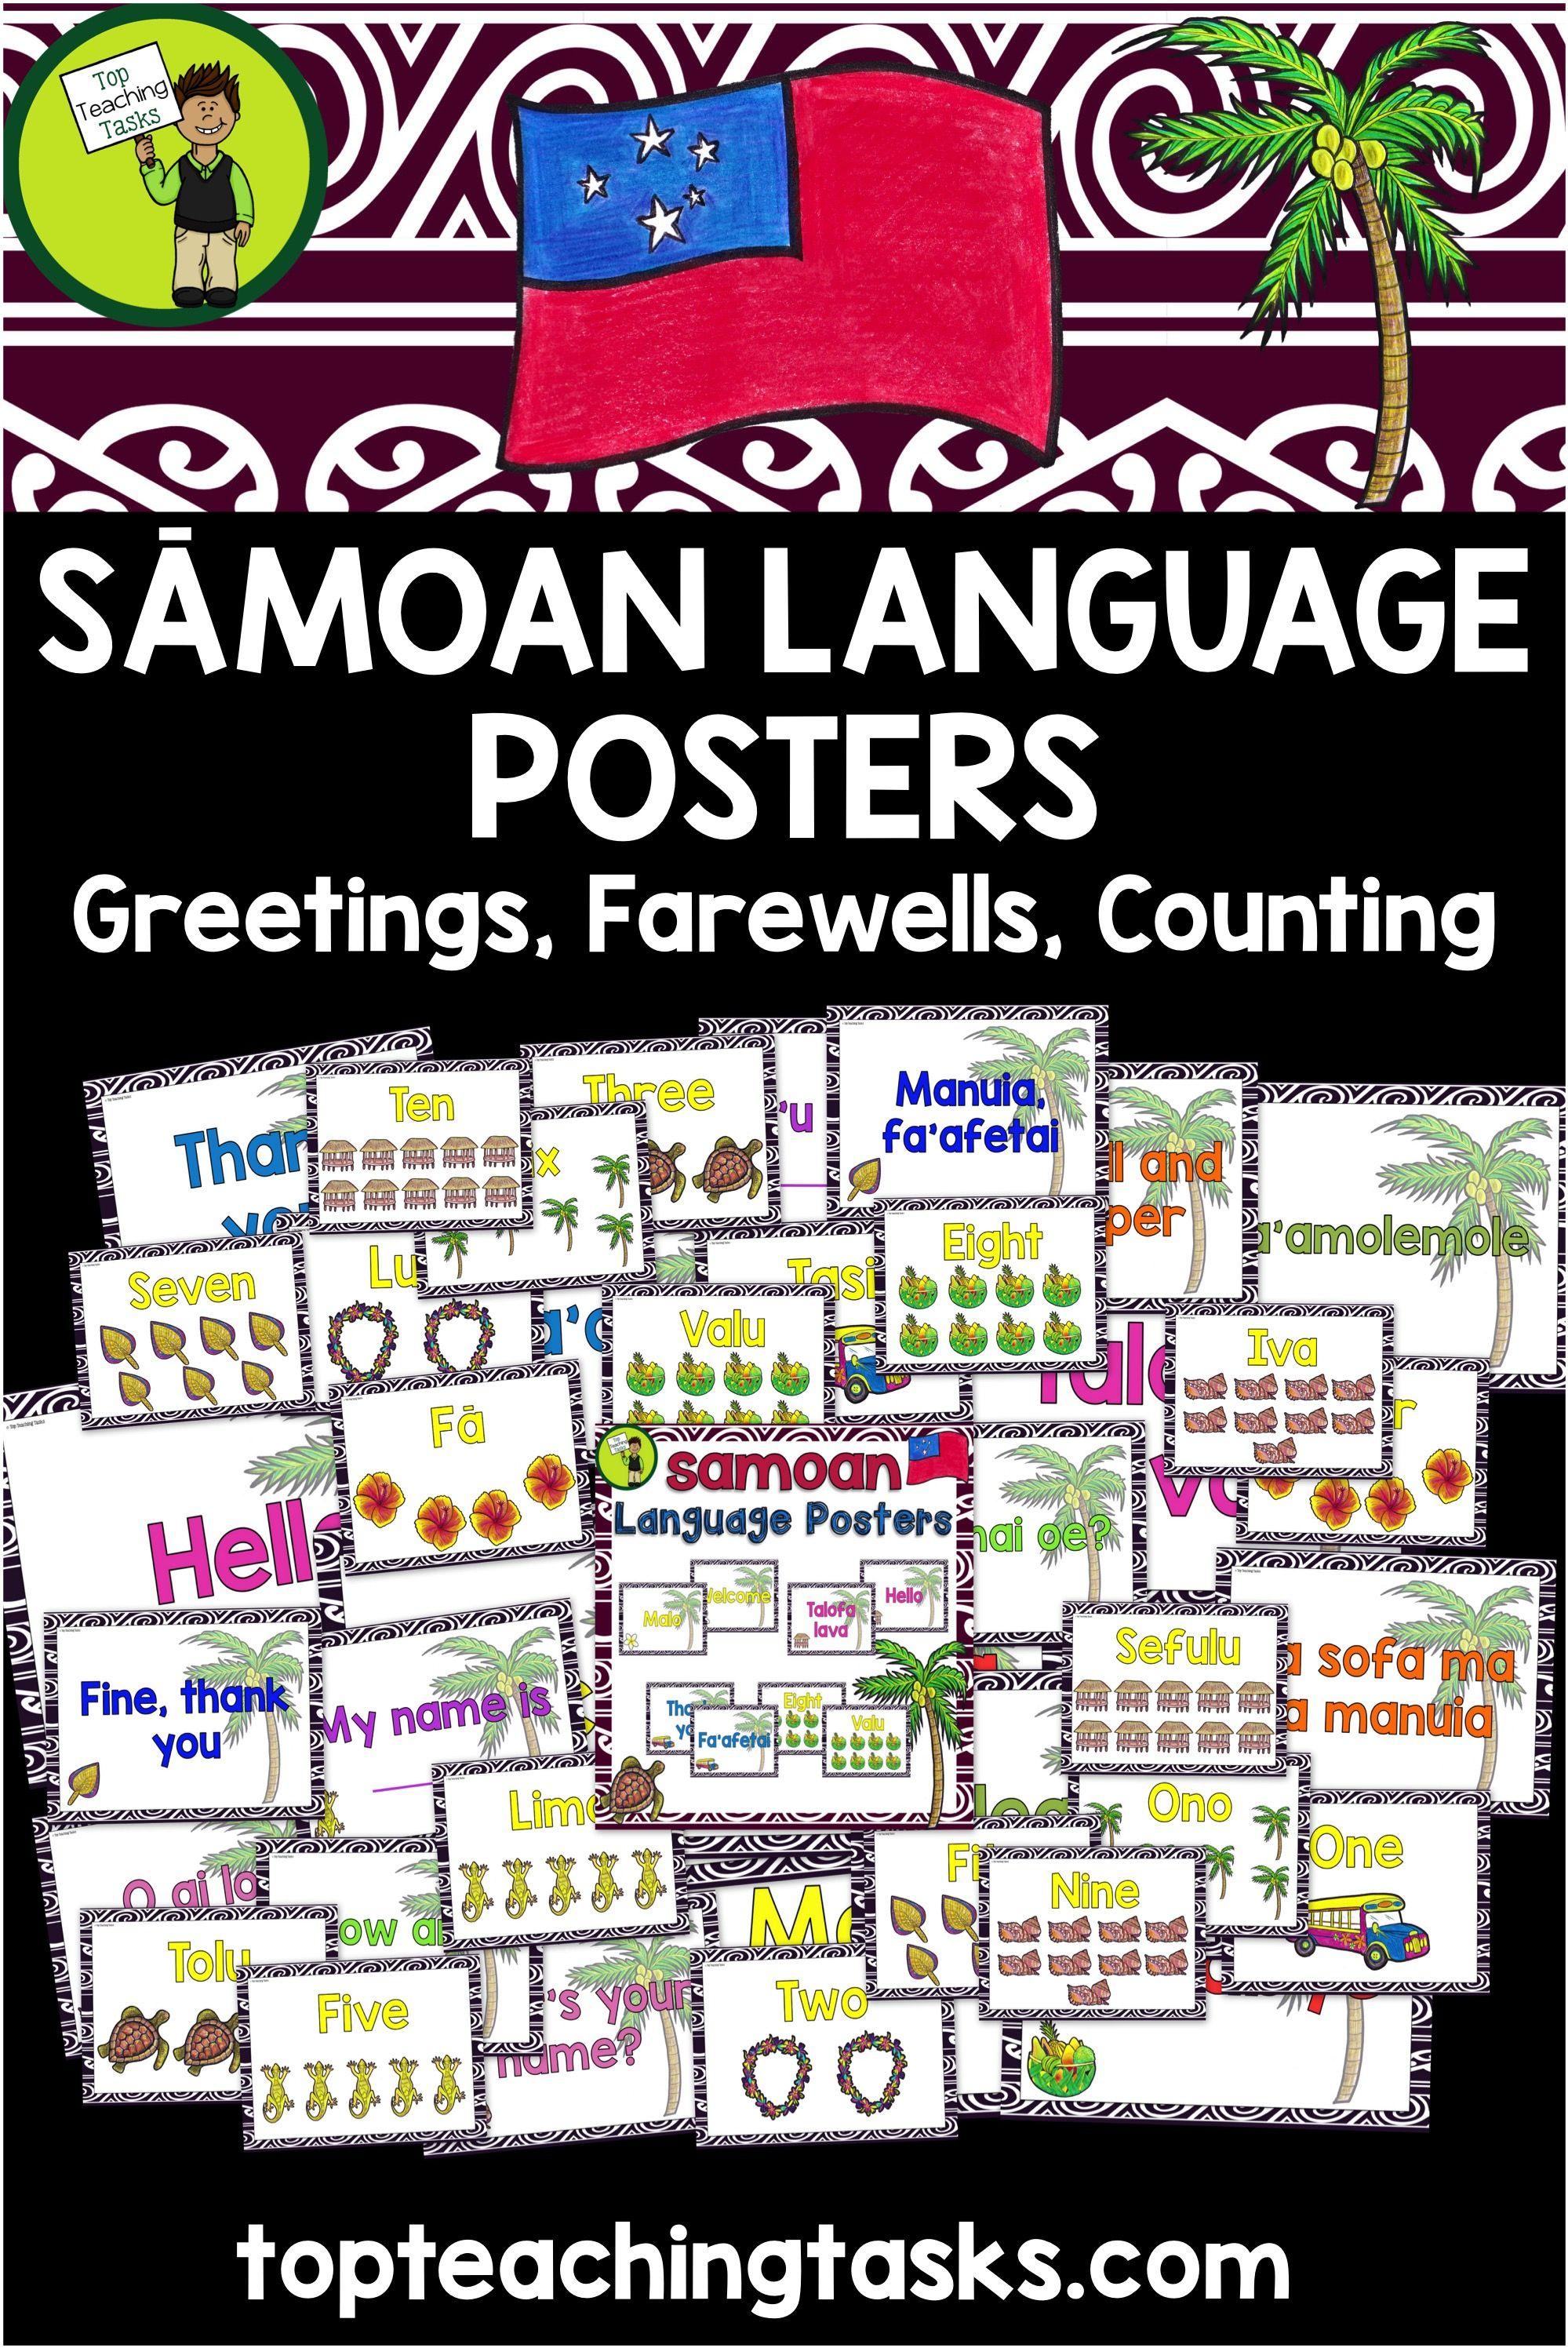 Samoan greetings introductions farewells counting classroom samoan language week samoan greetings introductions farewells and counting classroom display posters m4hsunfo